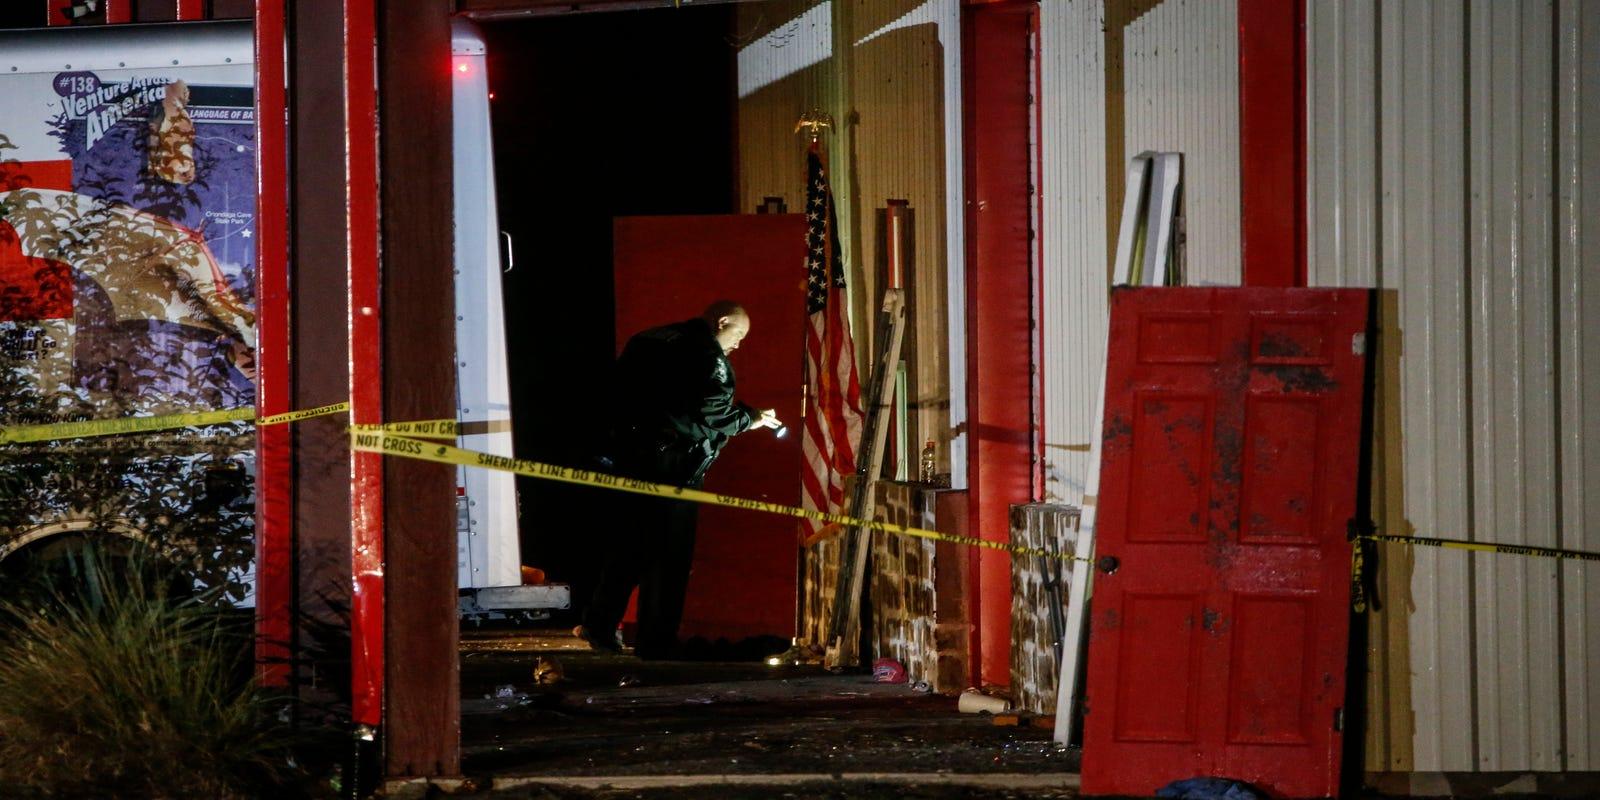 Texas Shooting Suspected Gunman Arrested Shots Fired At Vigil